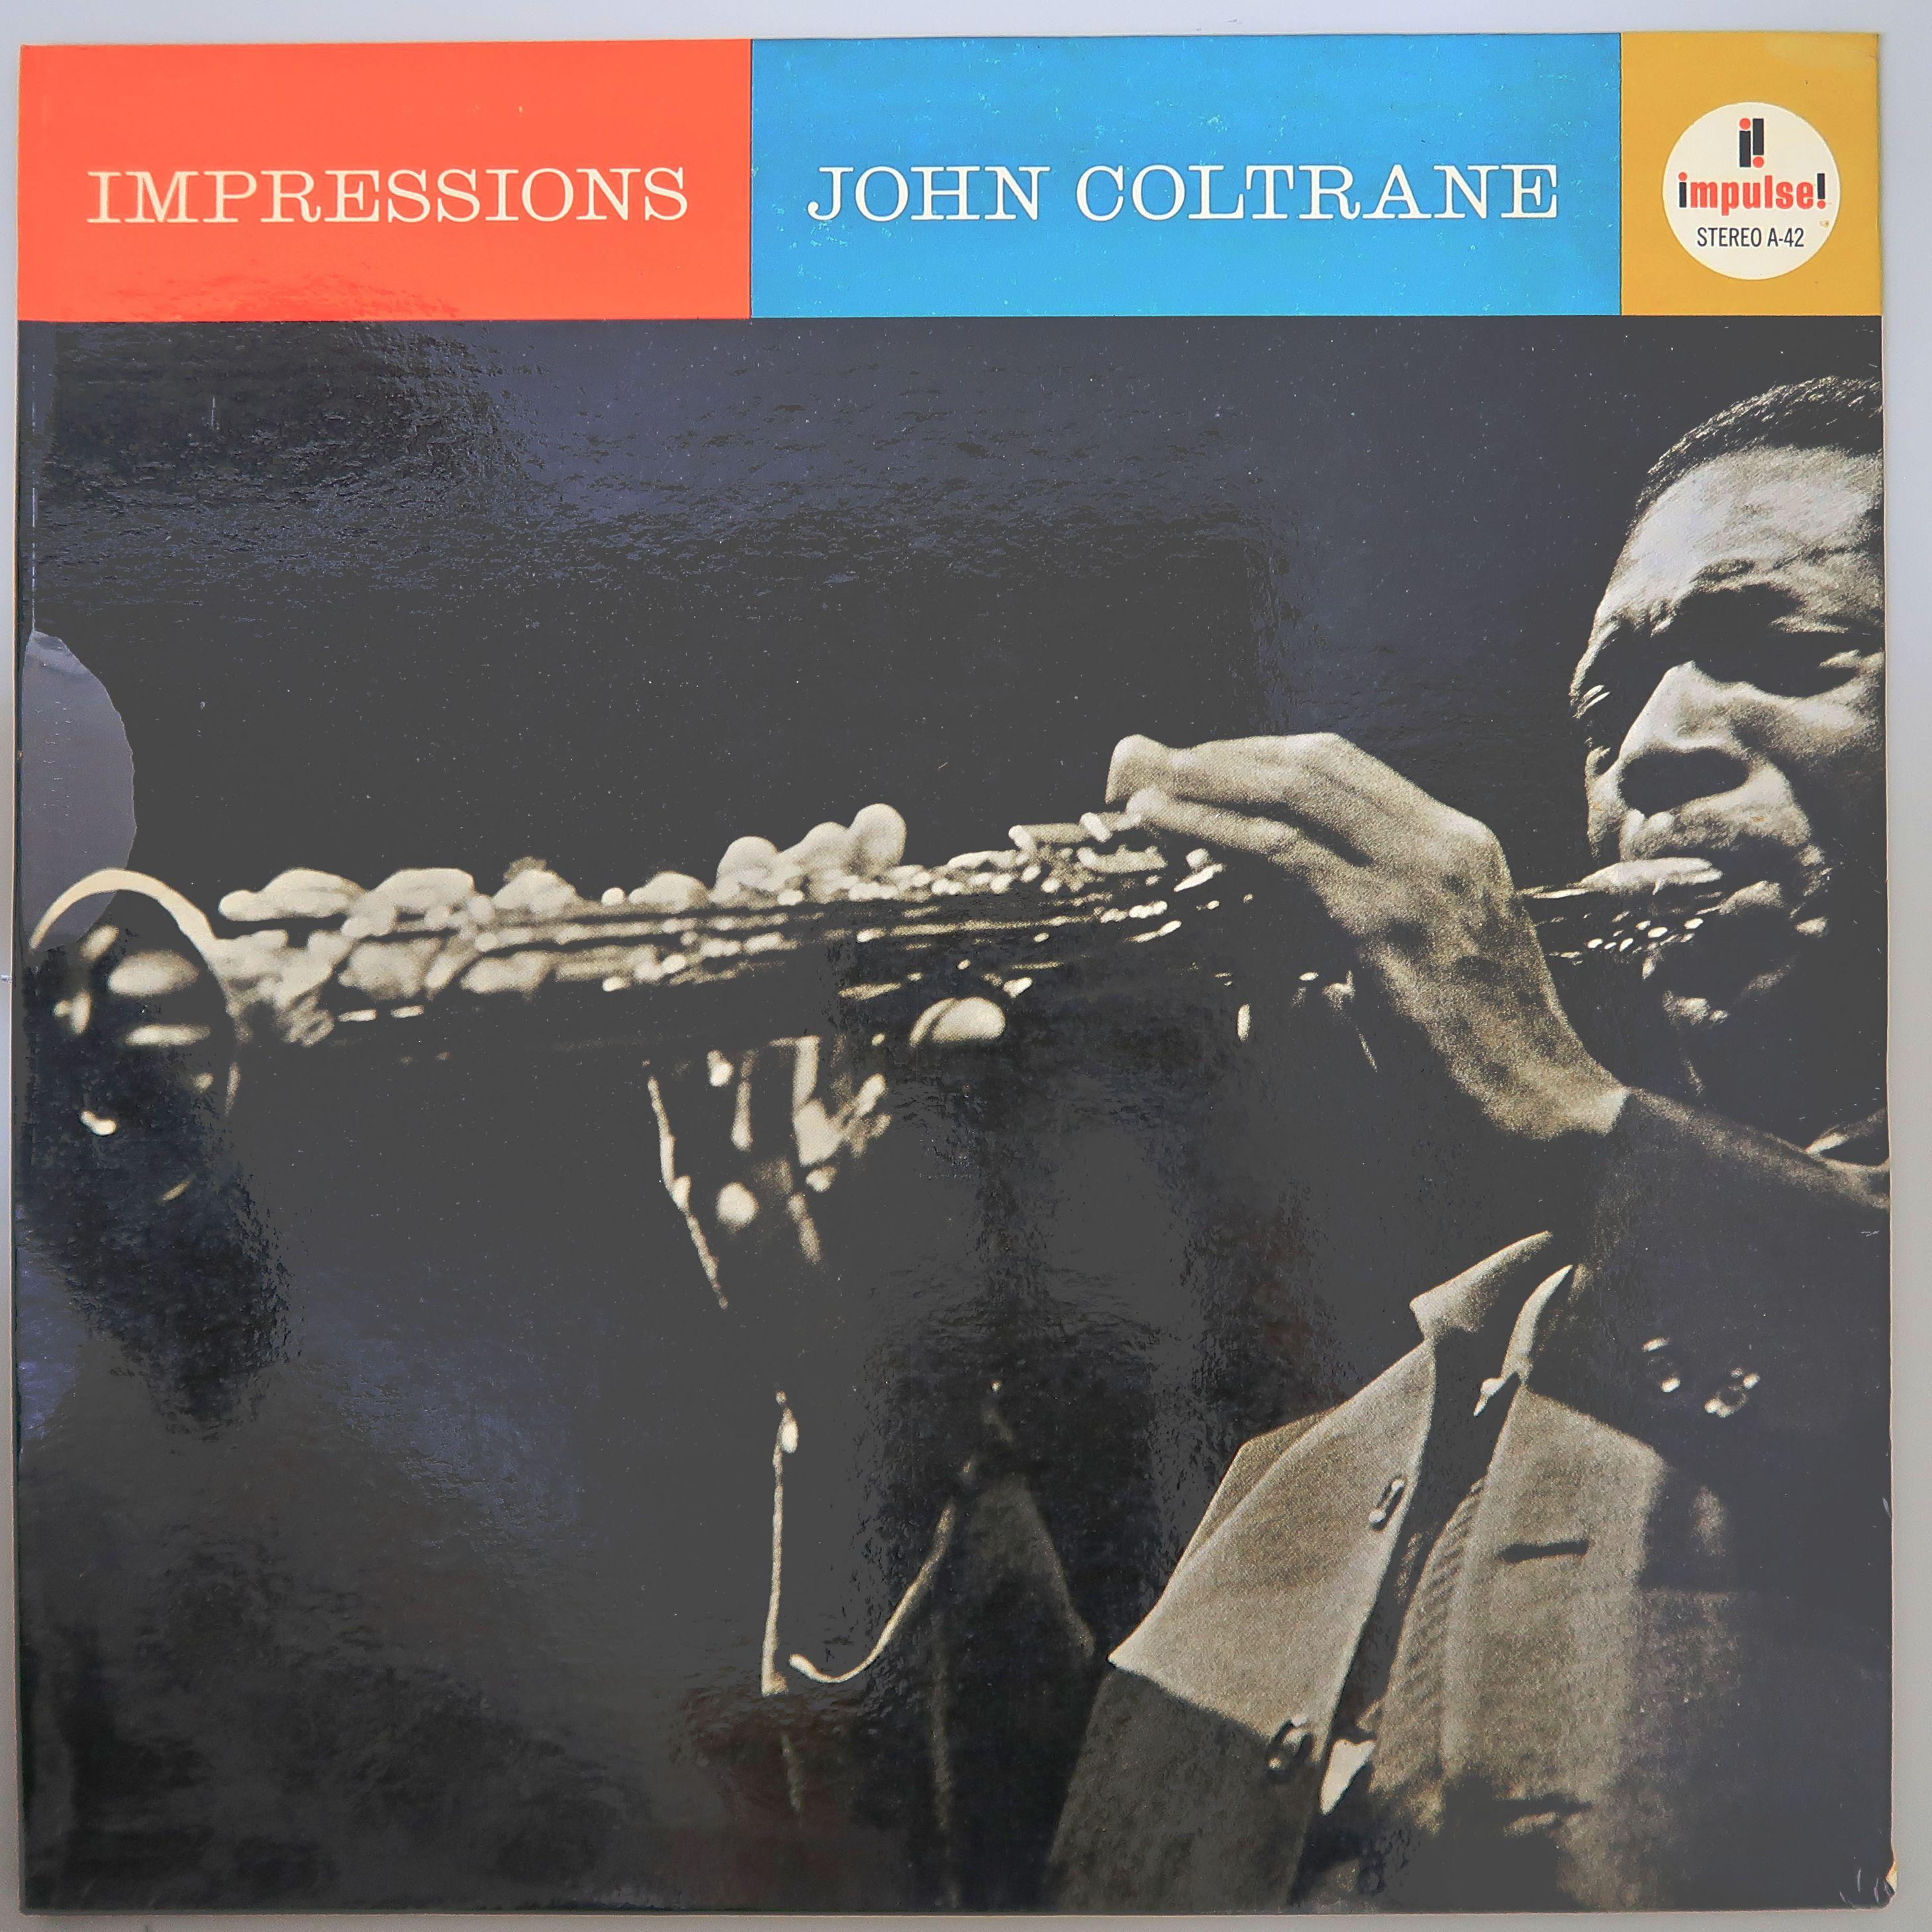 JOHN COLTRANE / IMPRESSIONS (US赤黒)